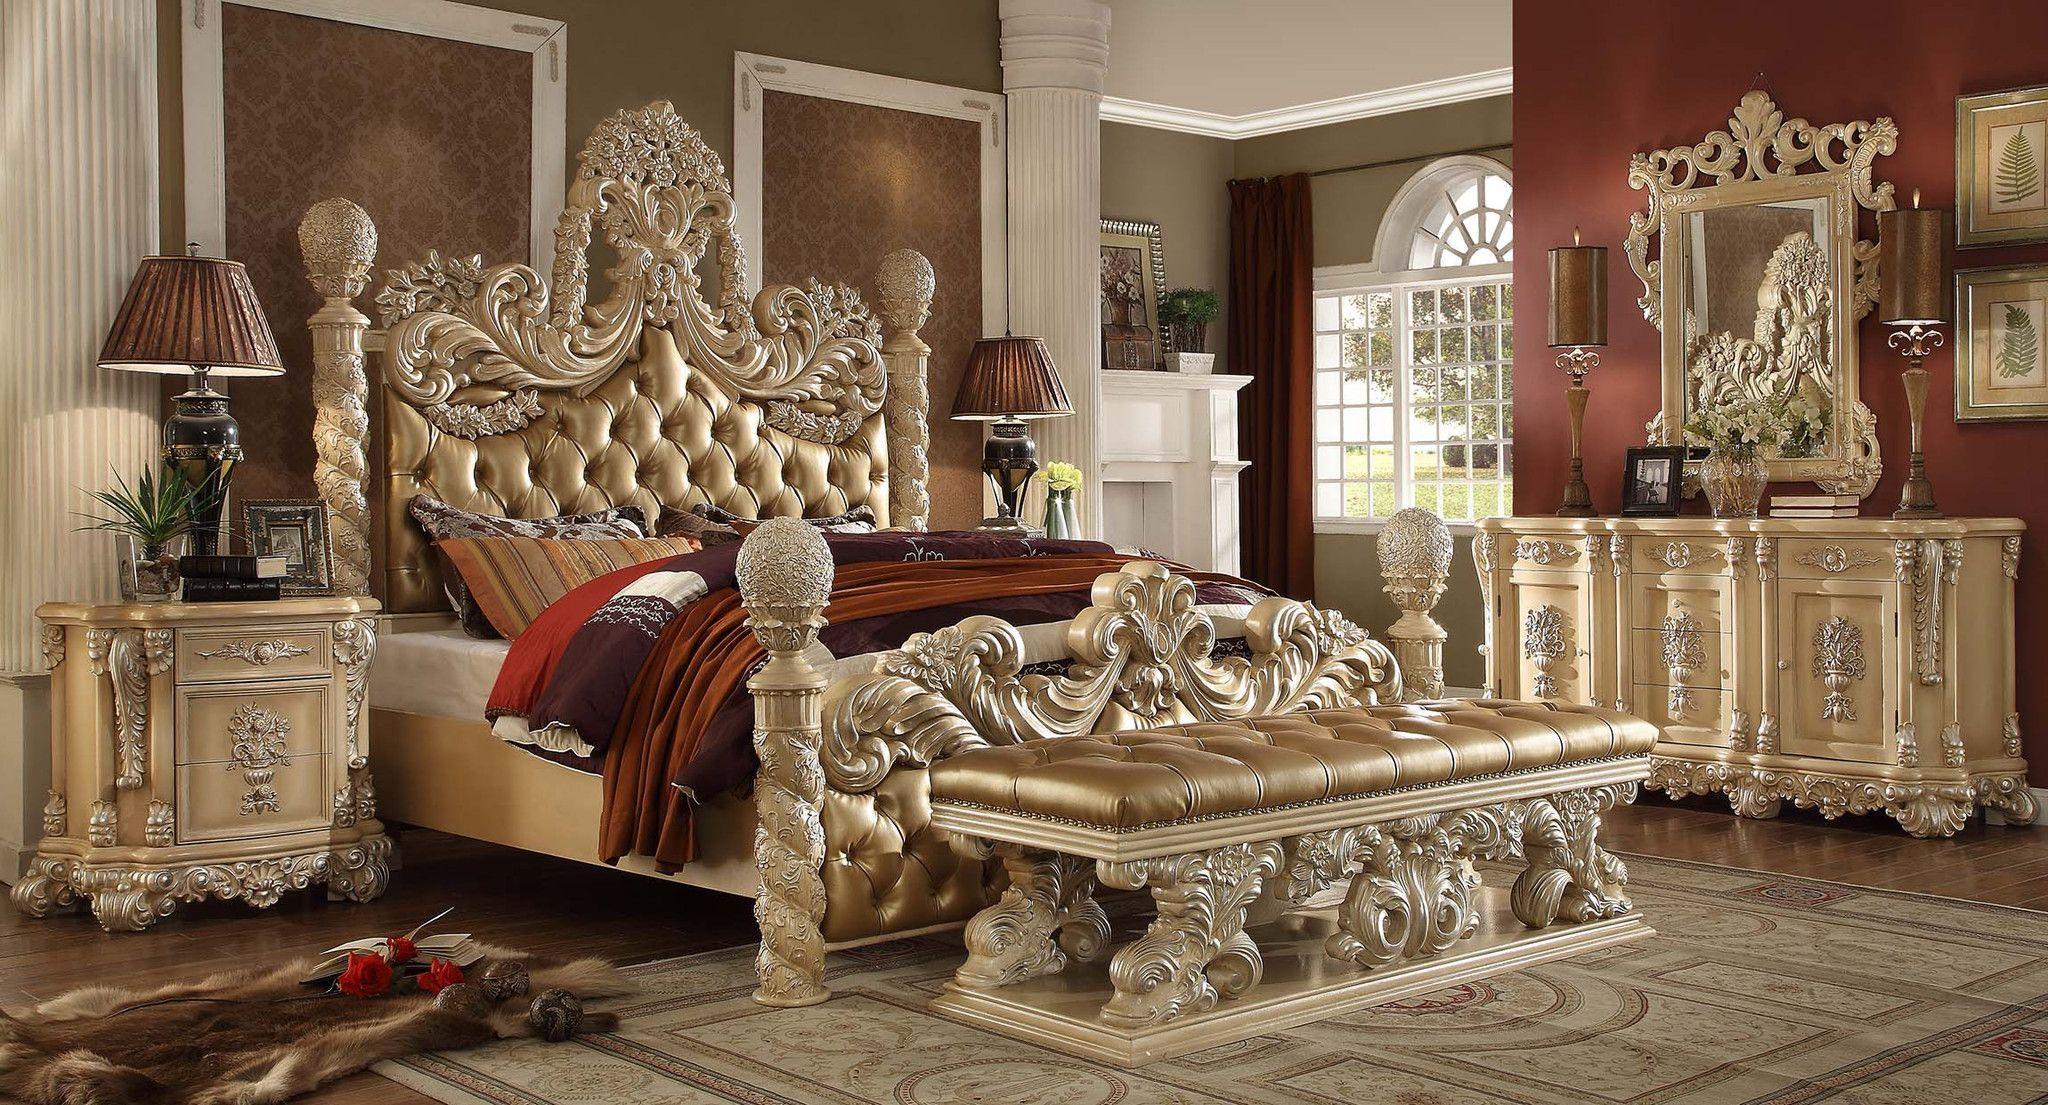 Homey Design Hd 7266 Victorian Classic King Bedroom Set